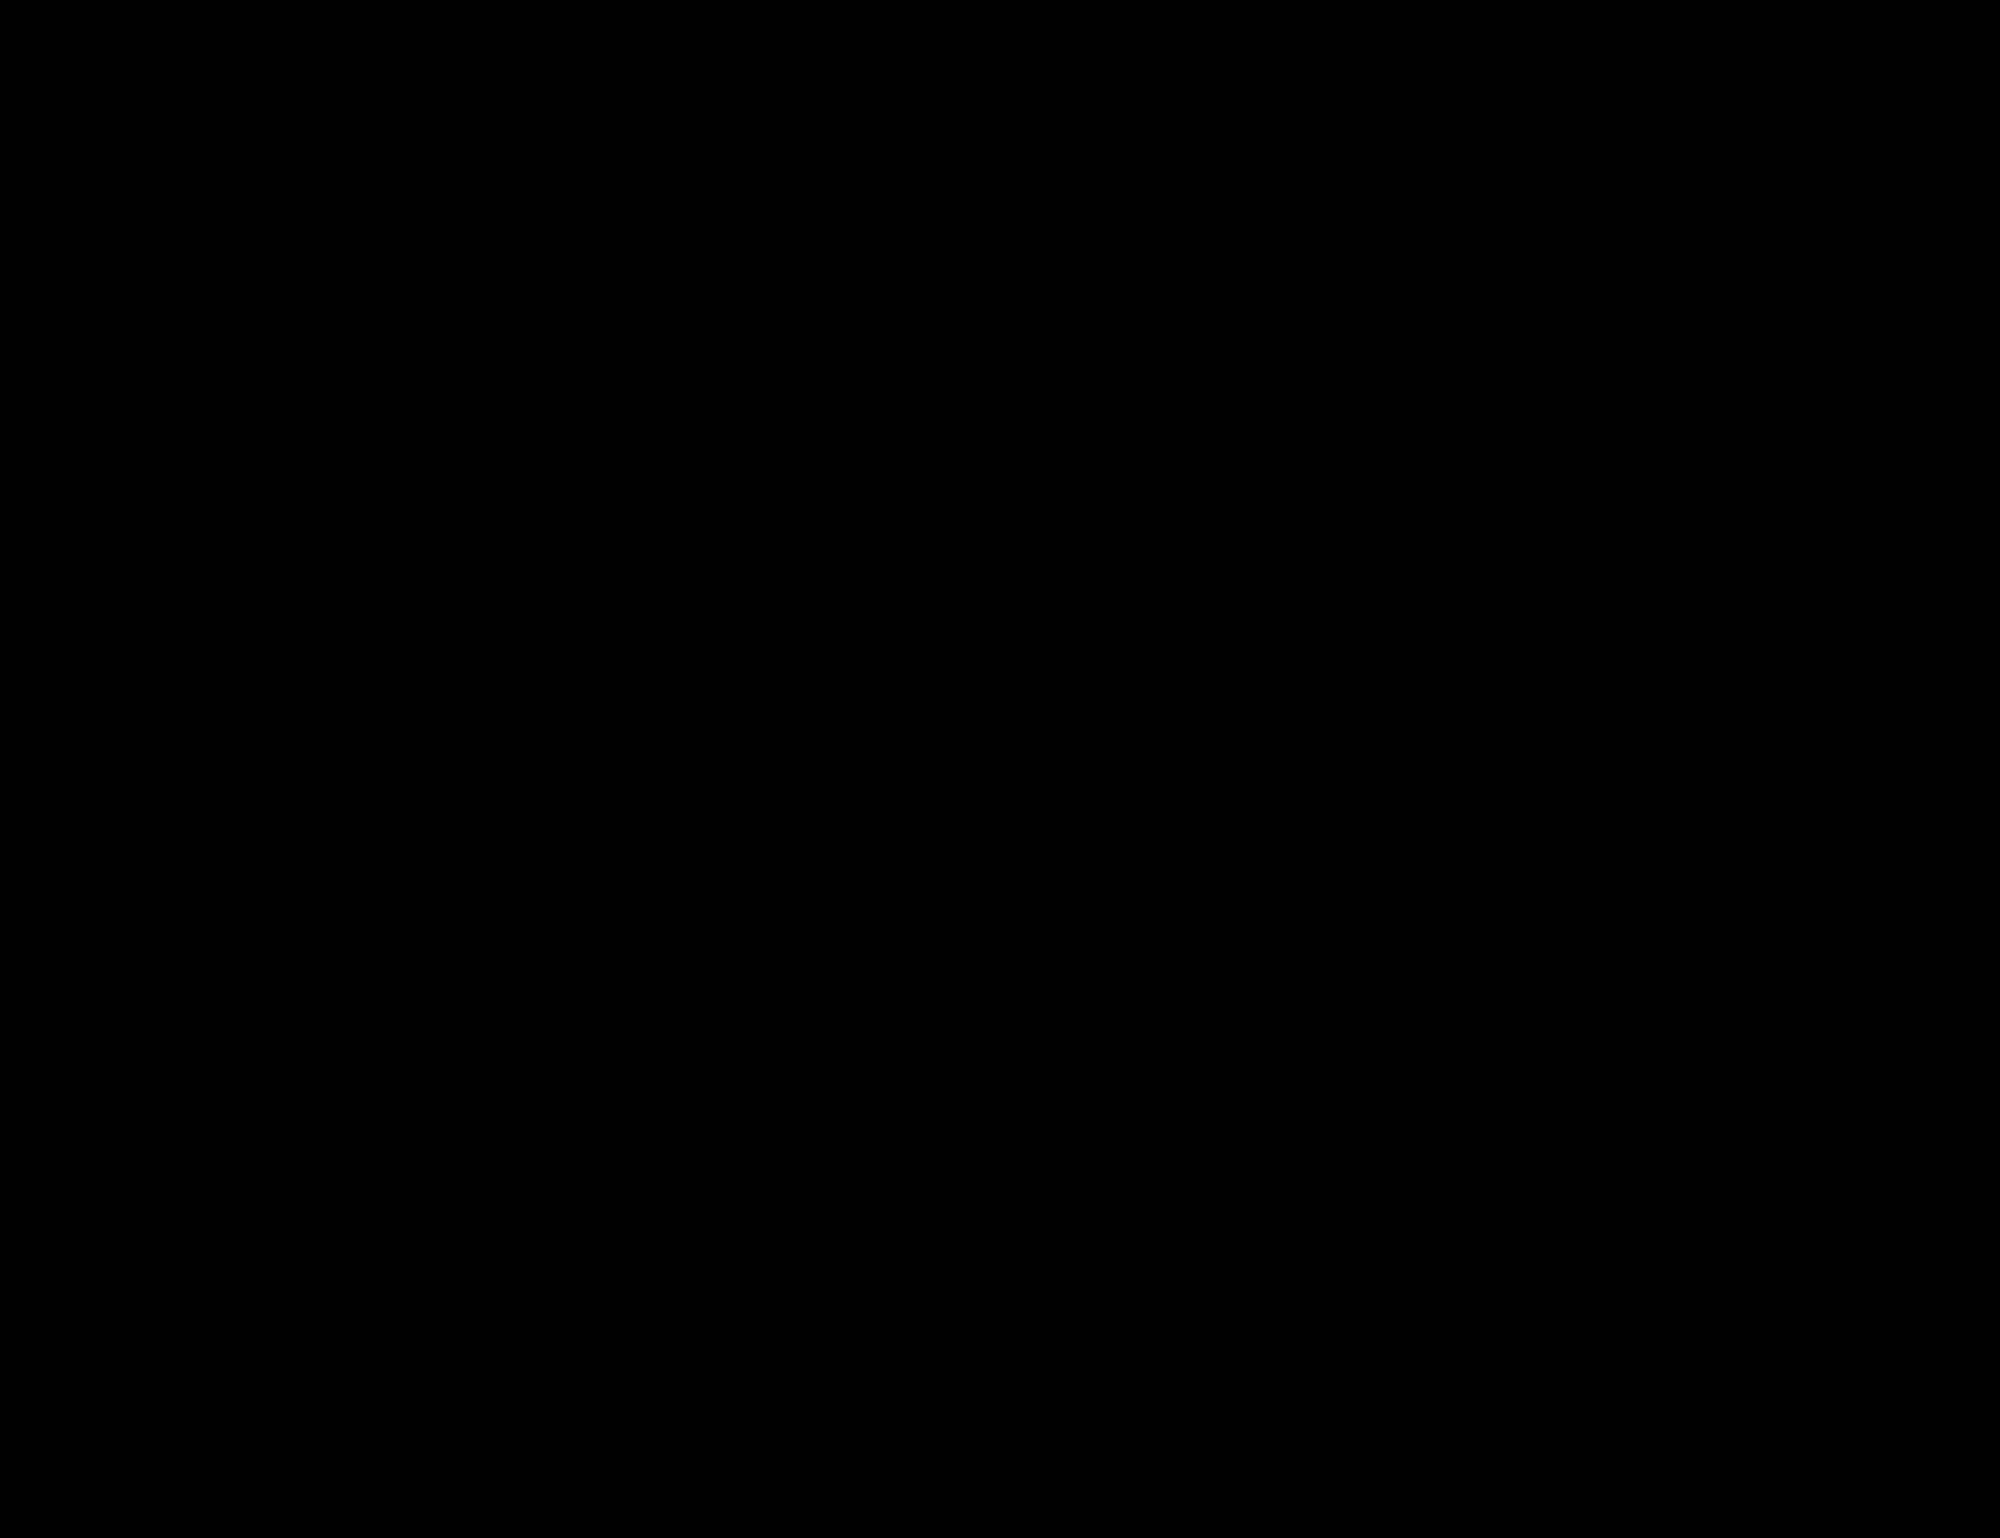 Lopolopo-logo-black-notagline-2000px.png